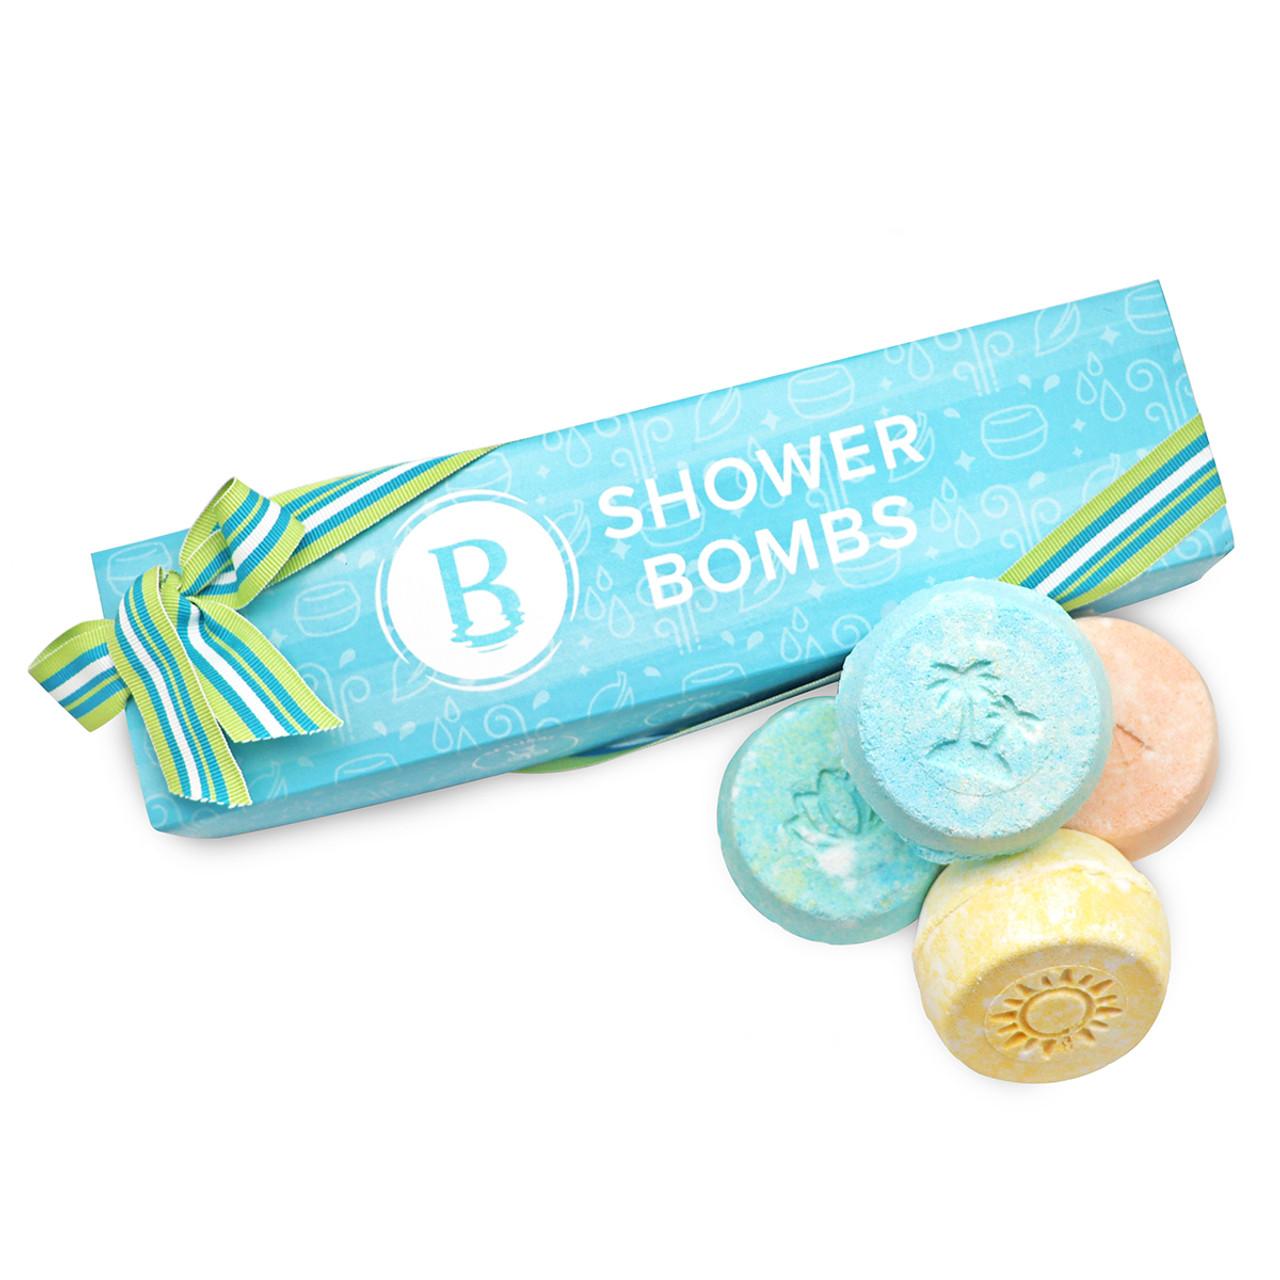 Summer Shower Bomb Box